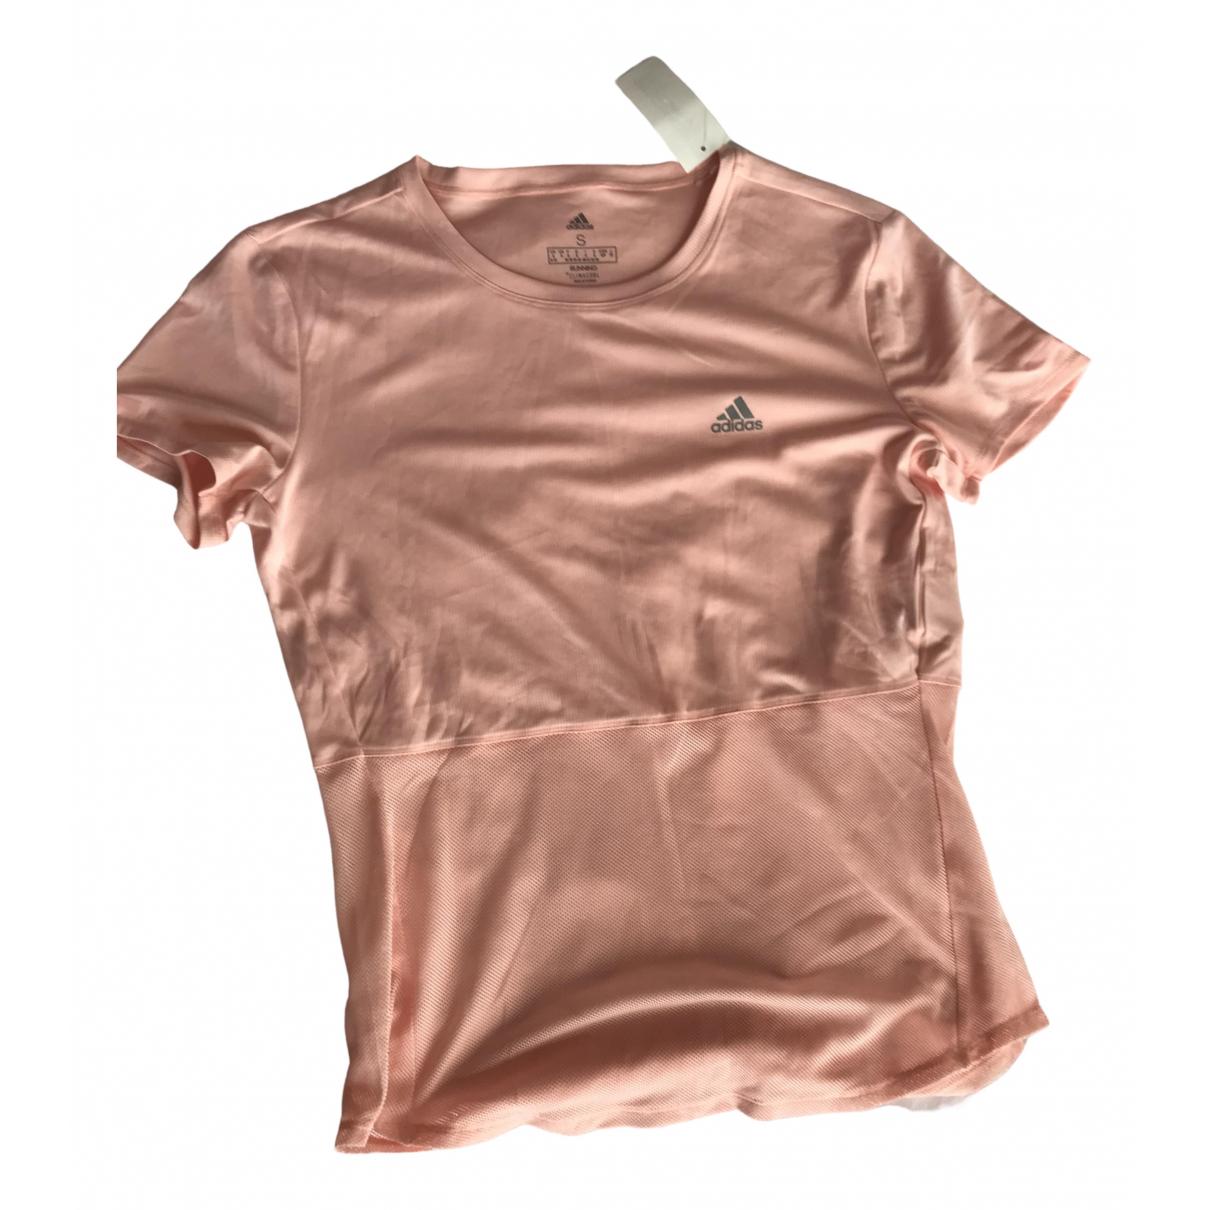 Adidas - Top   pour femme - rose